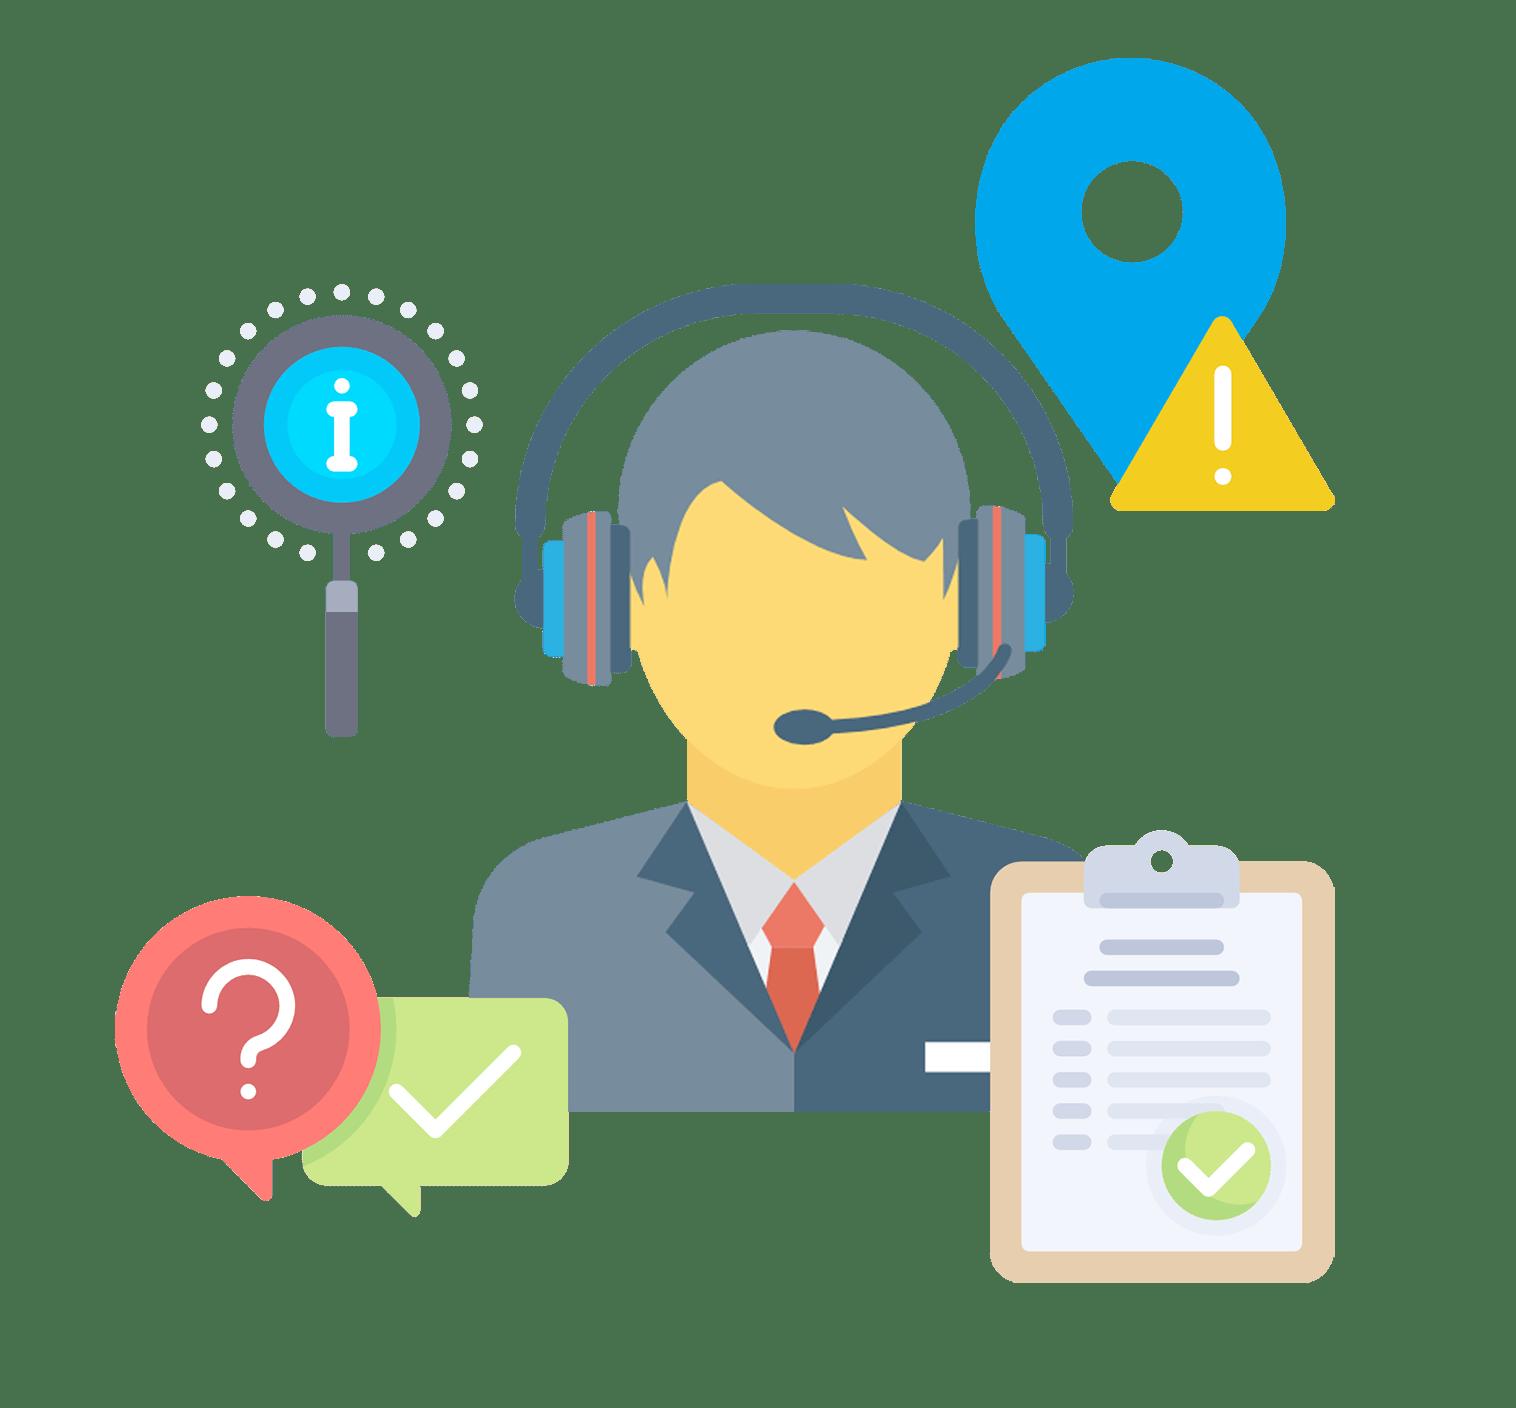 web-app-customer-support